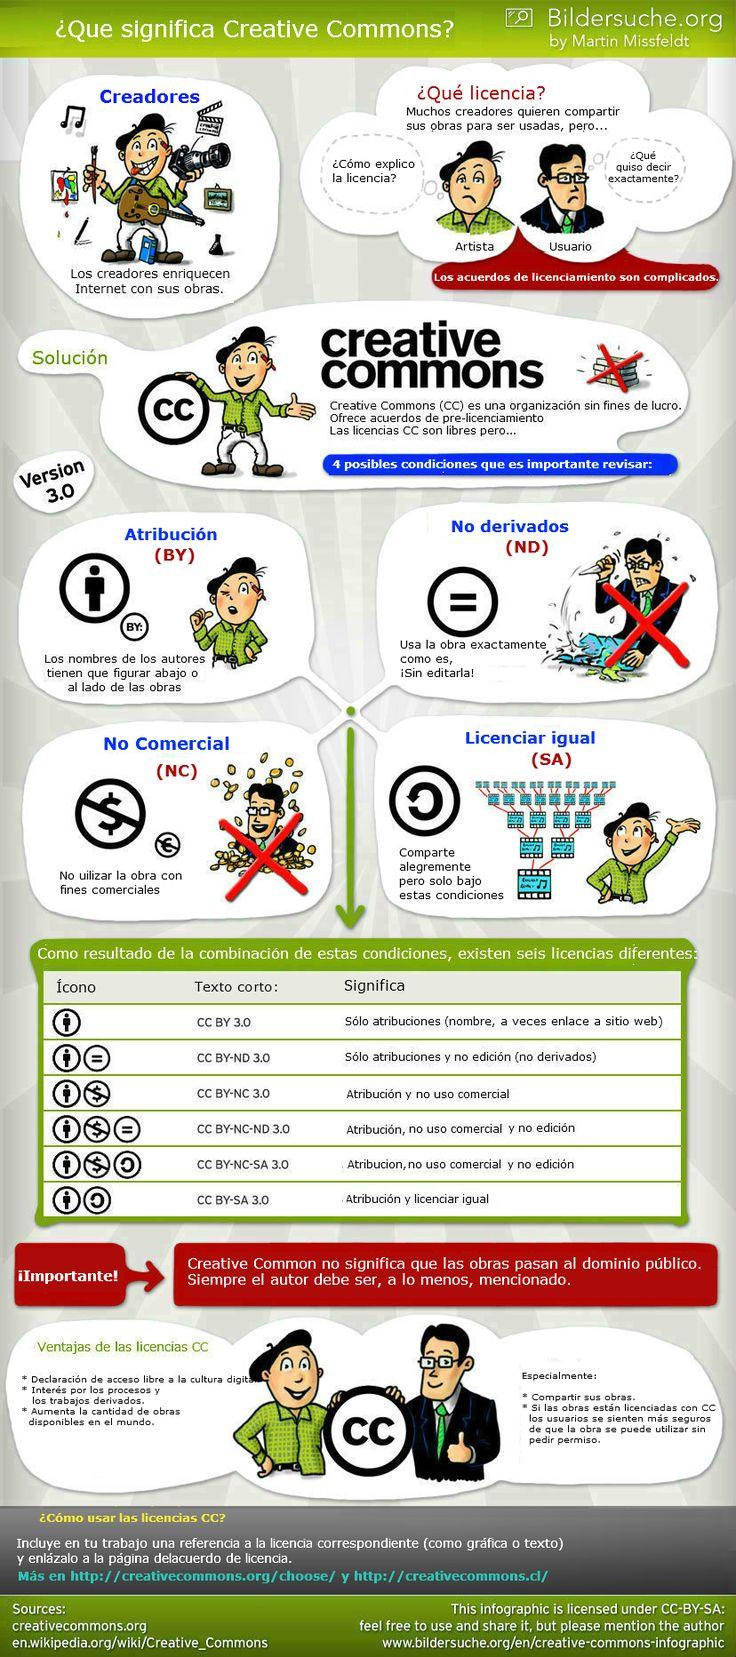 http://www.creativecommons.cl/2014/05/creative-commons-explicado-en-una-sencilla-infografia/